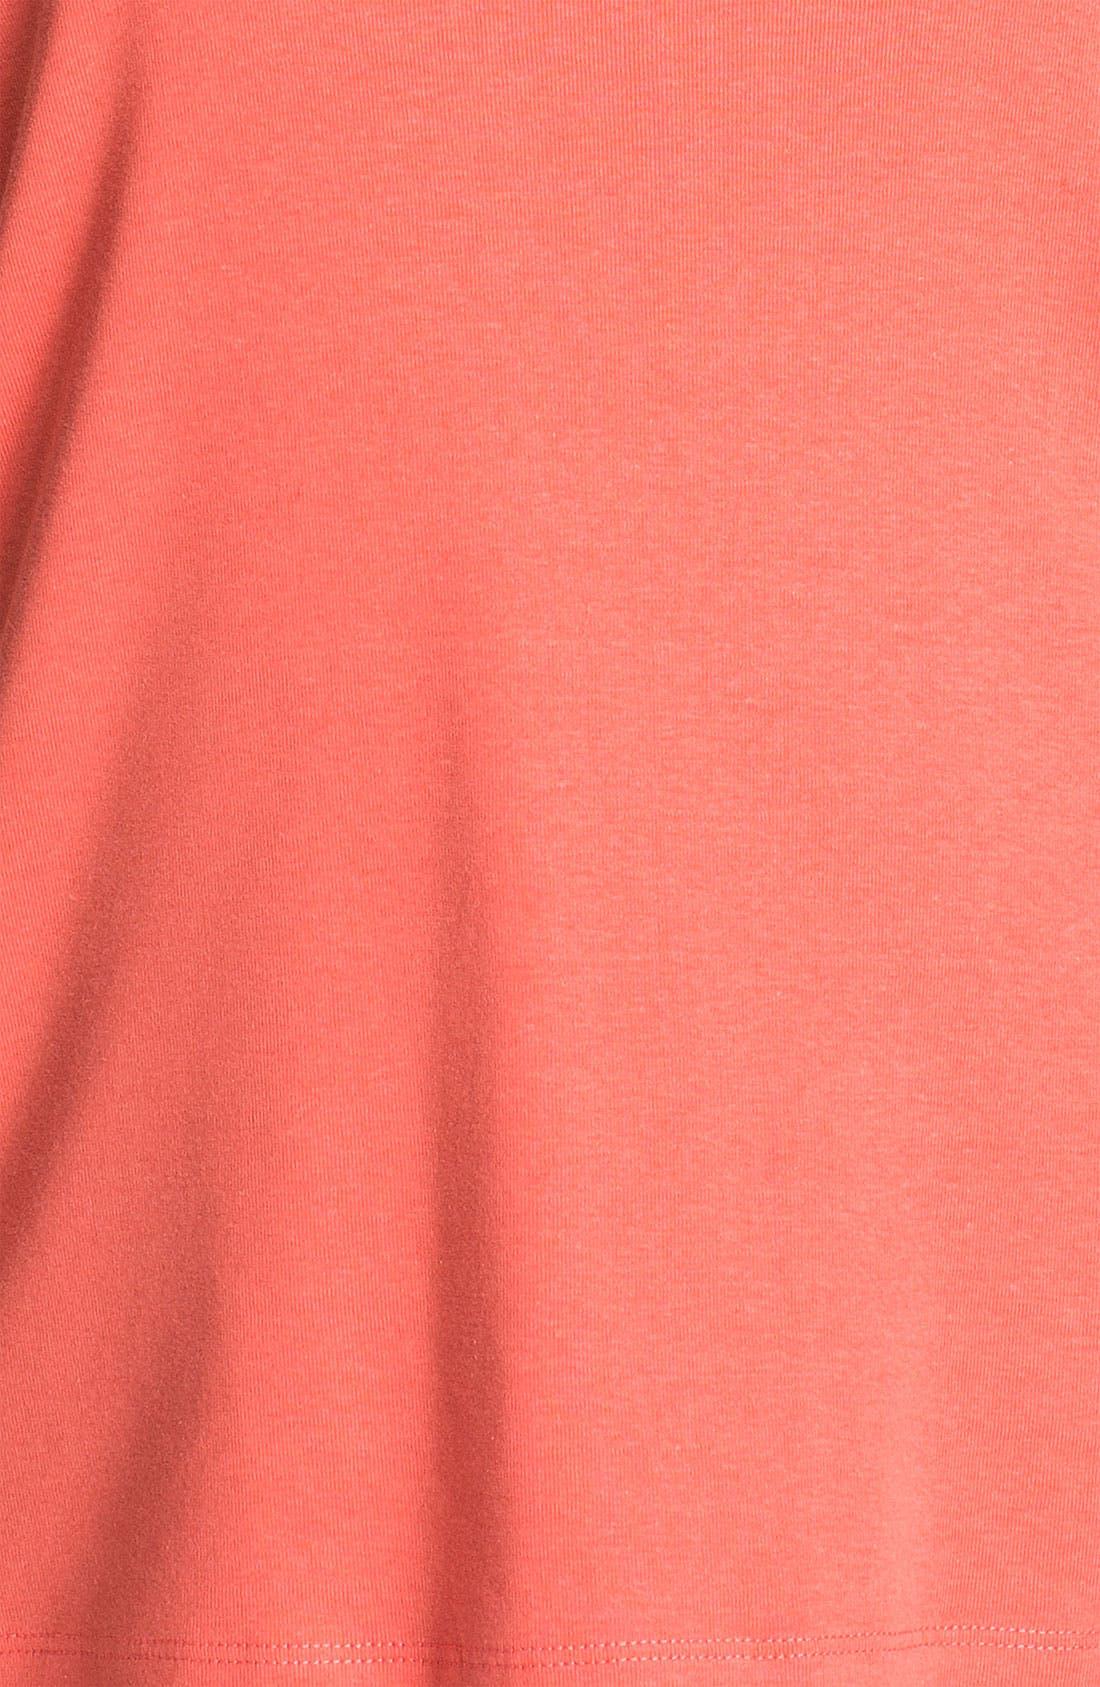 Alternate Image 3  - Sejour Elbow Sleeve Tee (Plus Size)